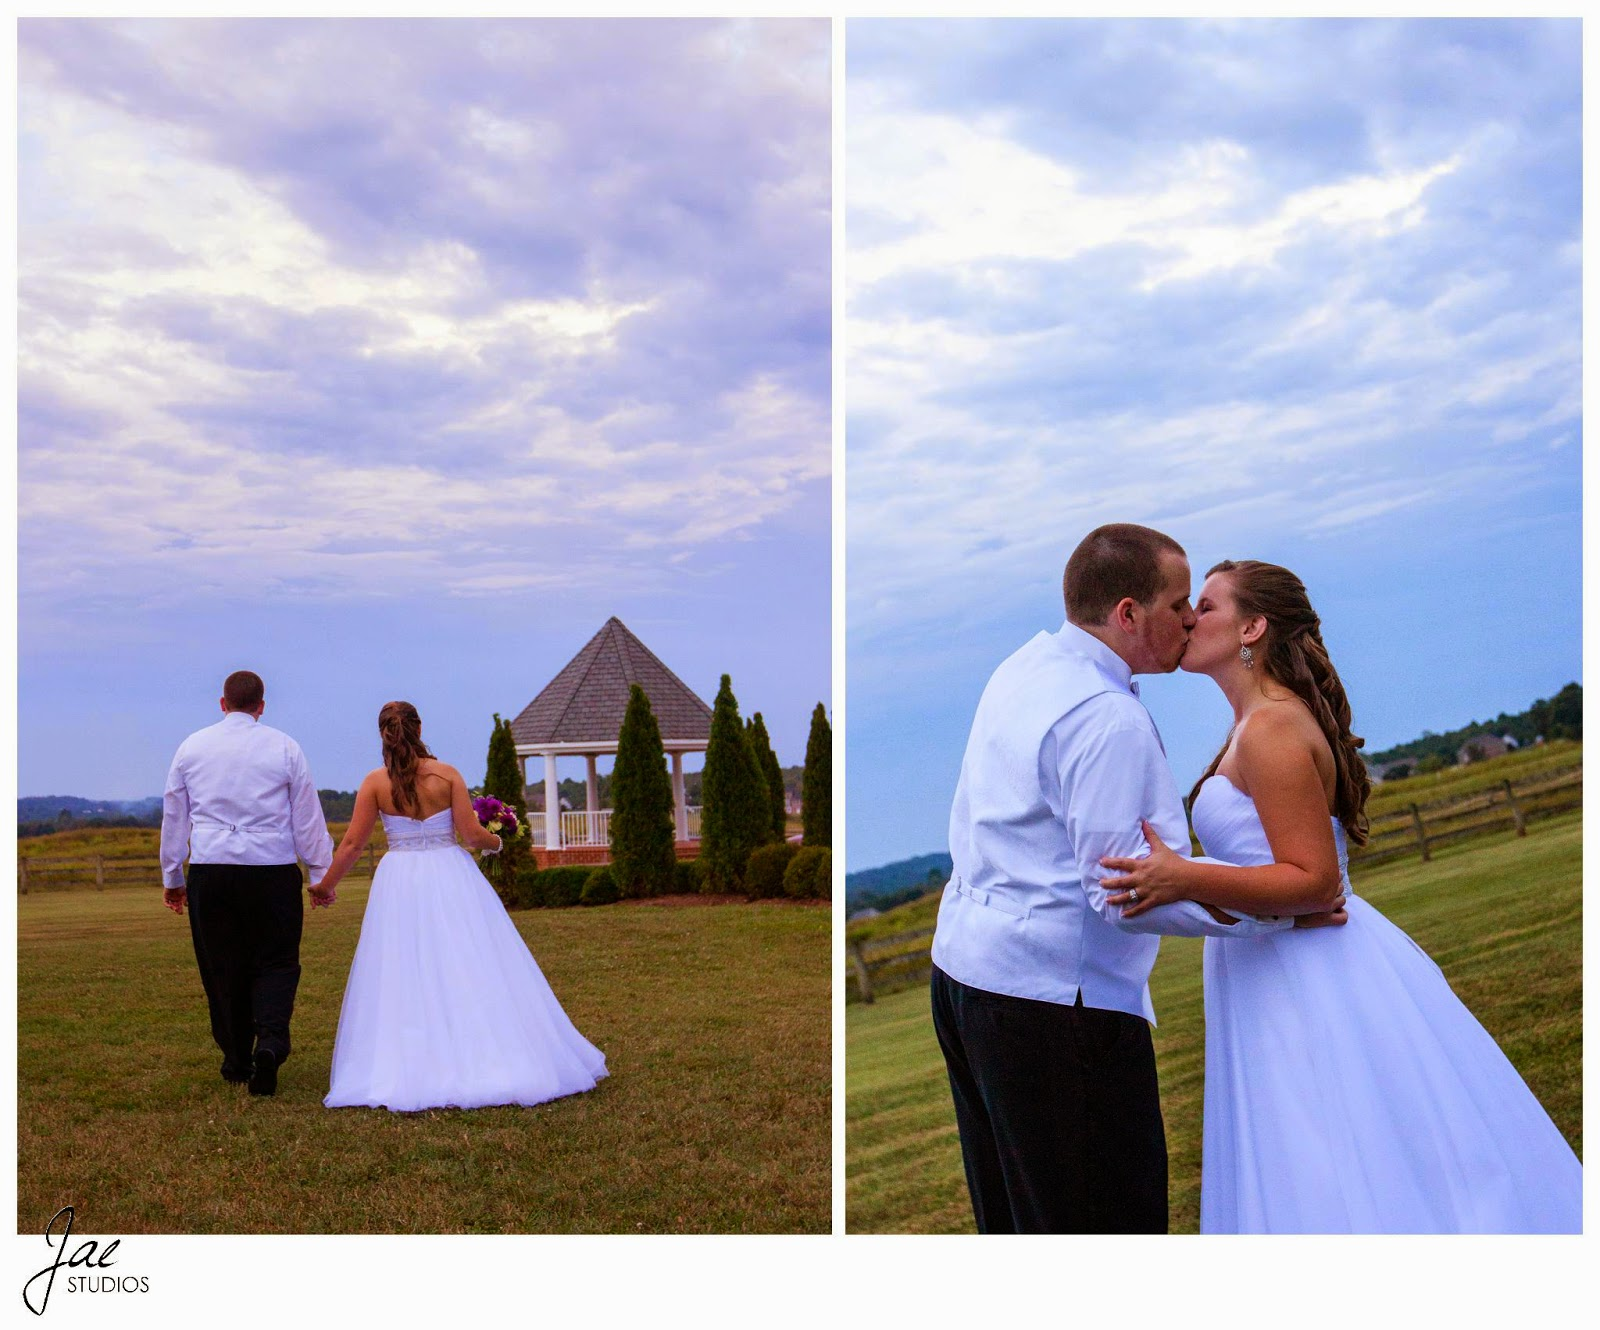 Jonathan and Julie, Bird cage, West Manor Estate, Wedding, Lynchburg, Virginia, Jae Studios, kissing, sky, grass, walking, wedding dress, tuxedo, bride, groom, holding hands